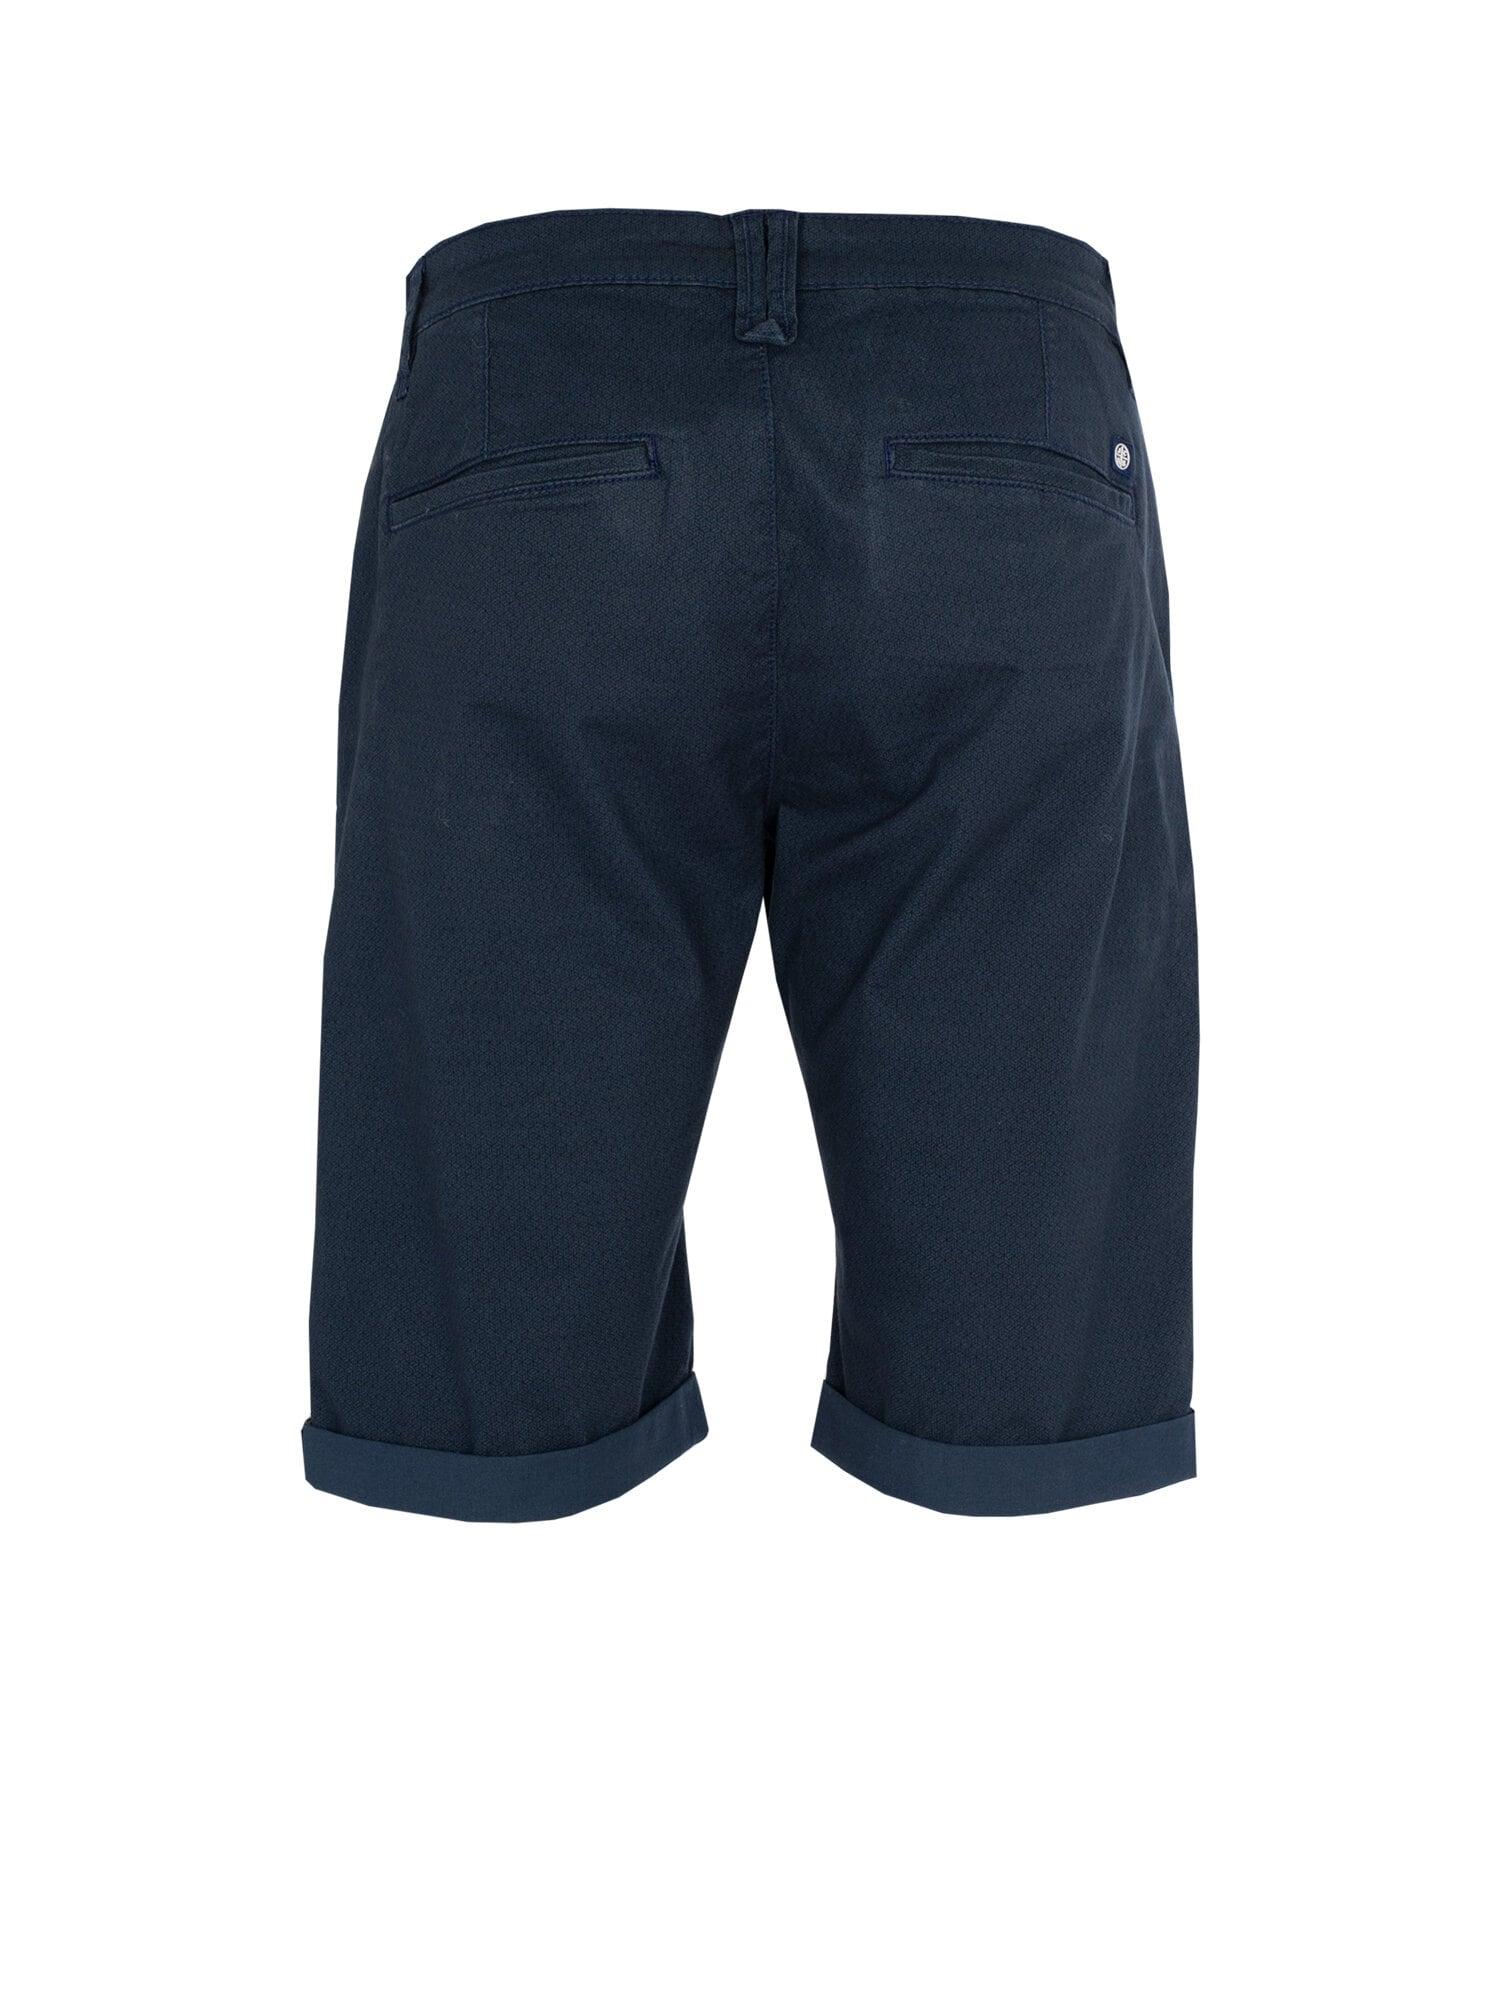 Print Shorts - Navy